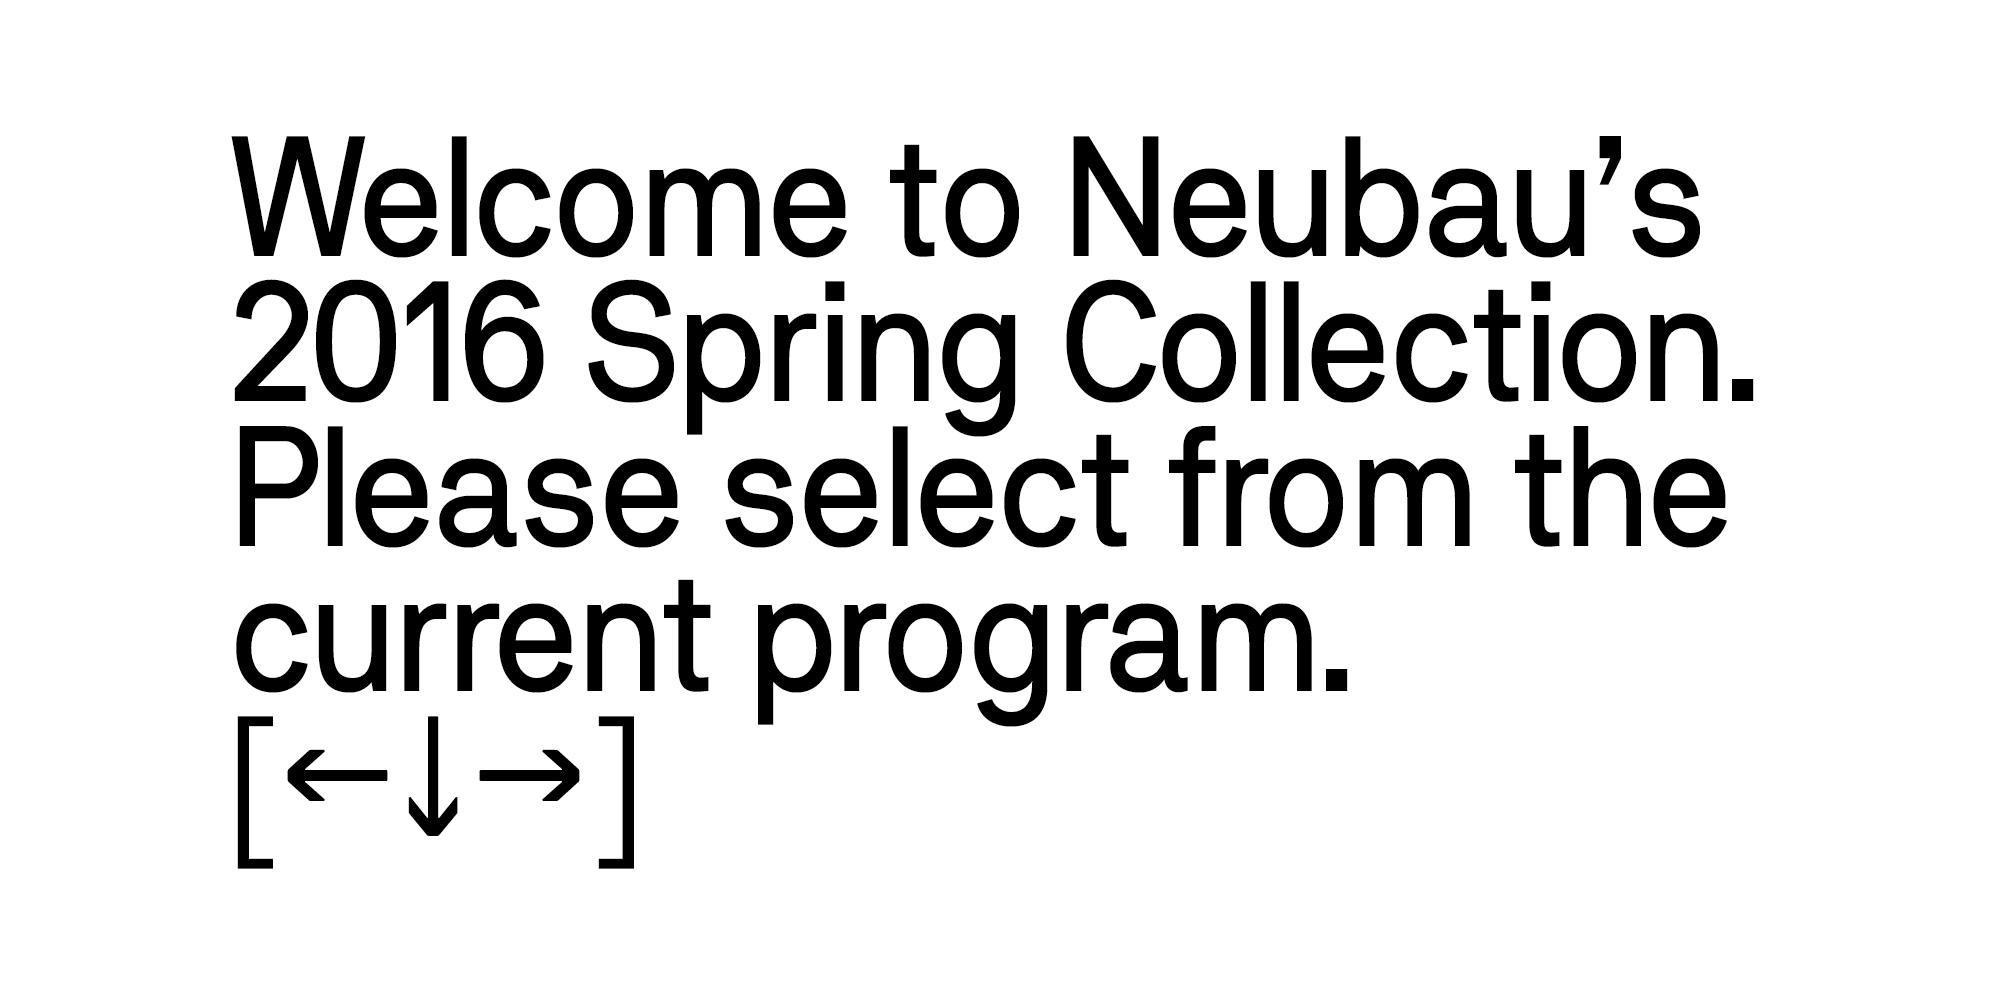 NBL-SPRING16